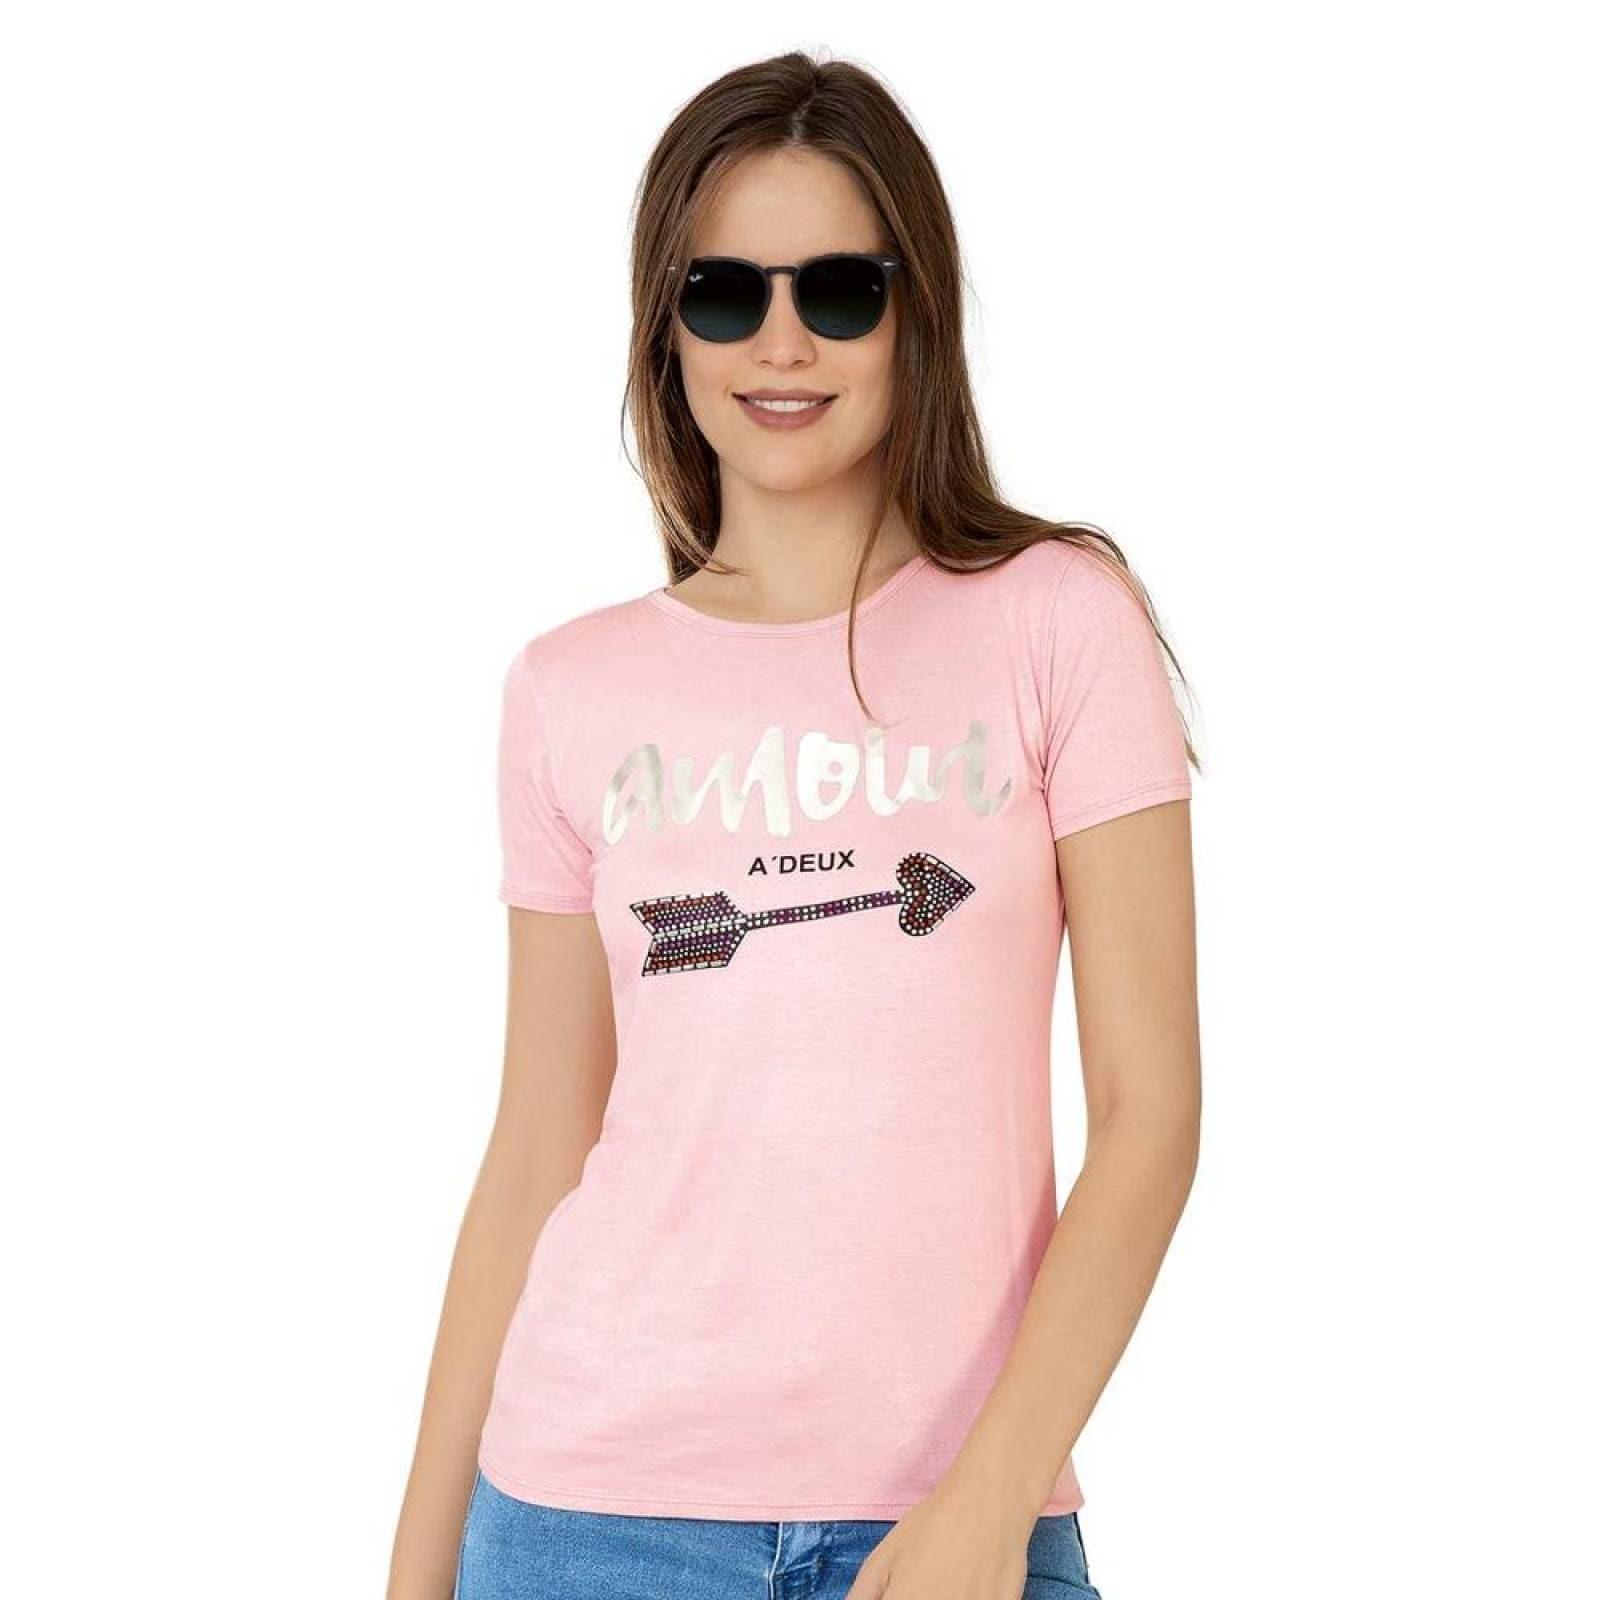 Playera Mandarine Mujer Rosa Spandex 100137